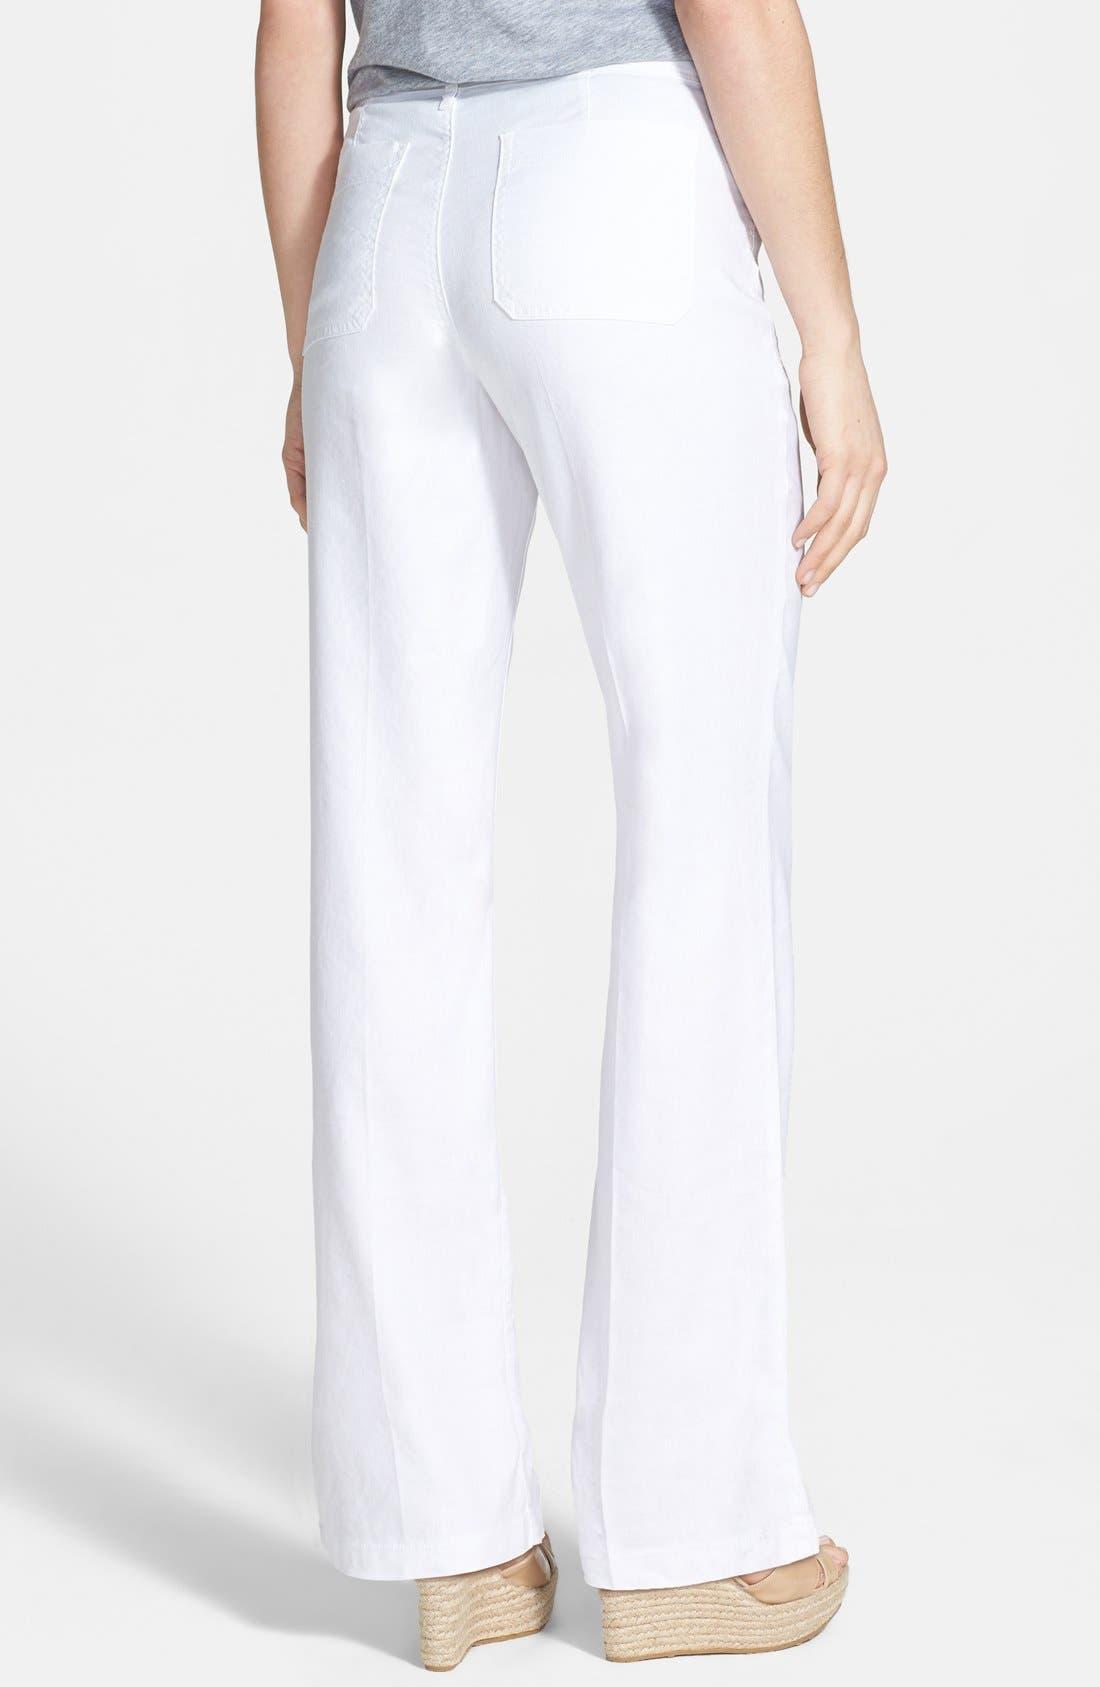 Alternate Image 2  - NYDJ 'Wylie' Stretch Linen Trousers (Plus Size)